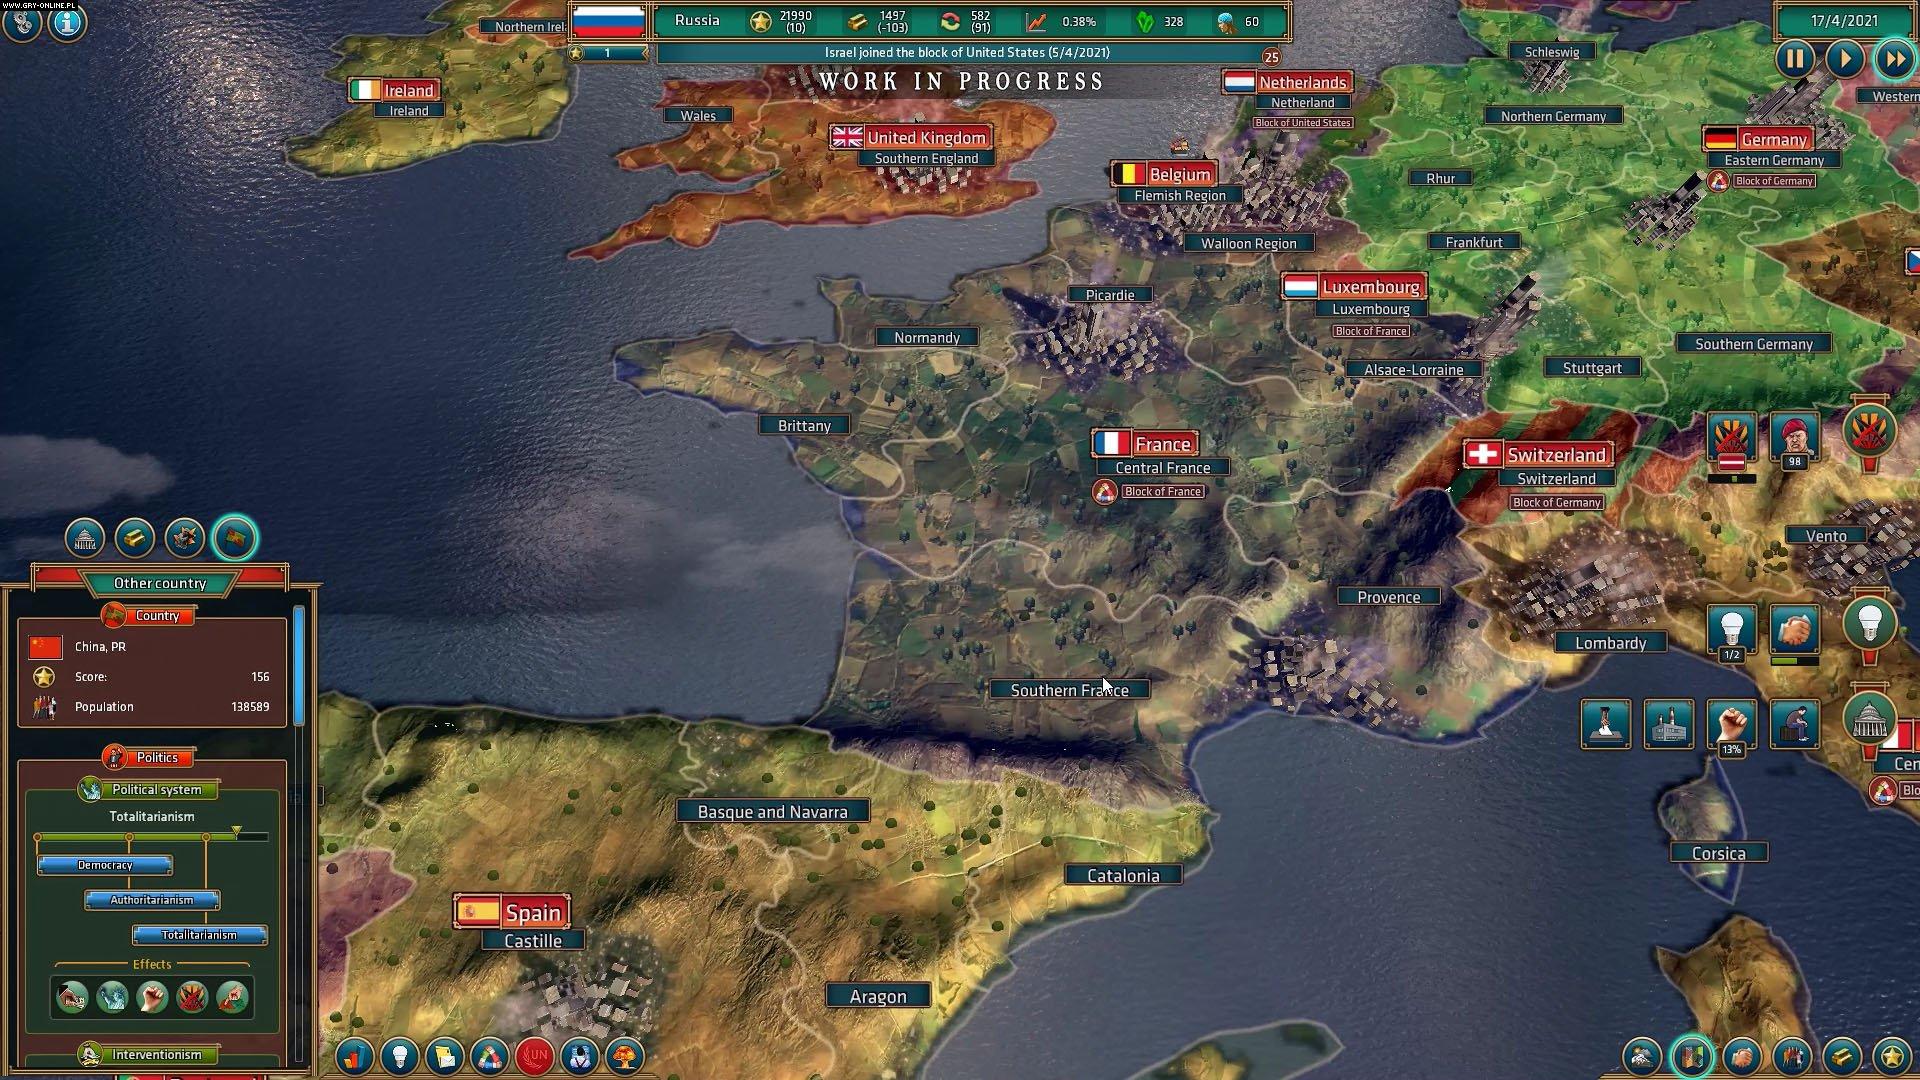 Realpolitiks PC Games Image 18/18, Jujubee, 1C